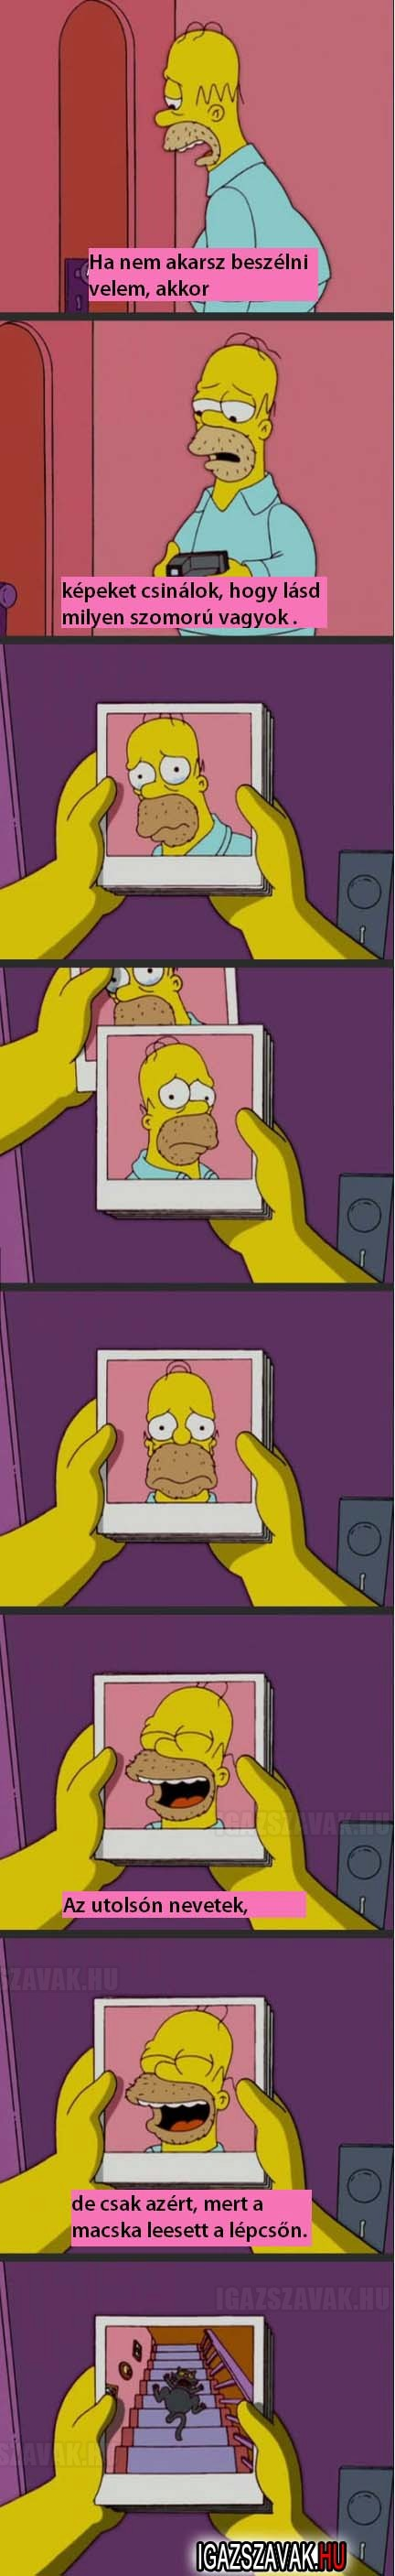 Homer logika